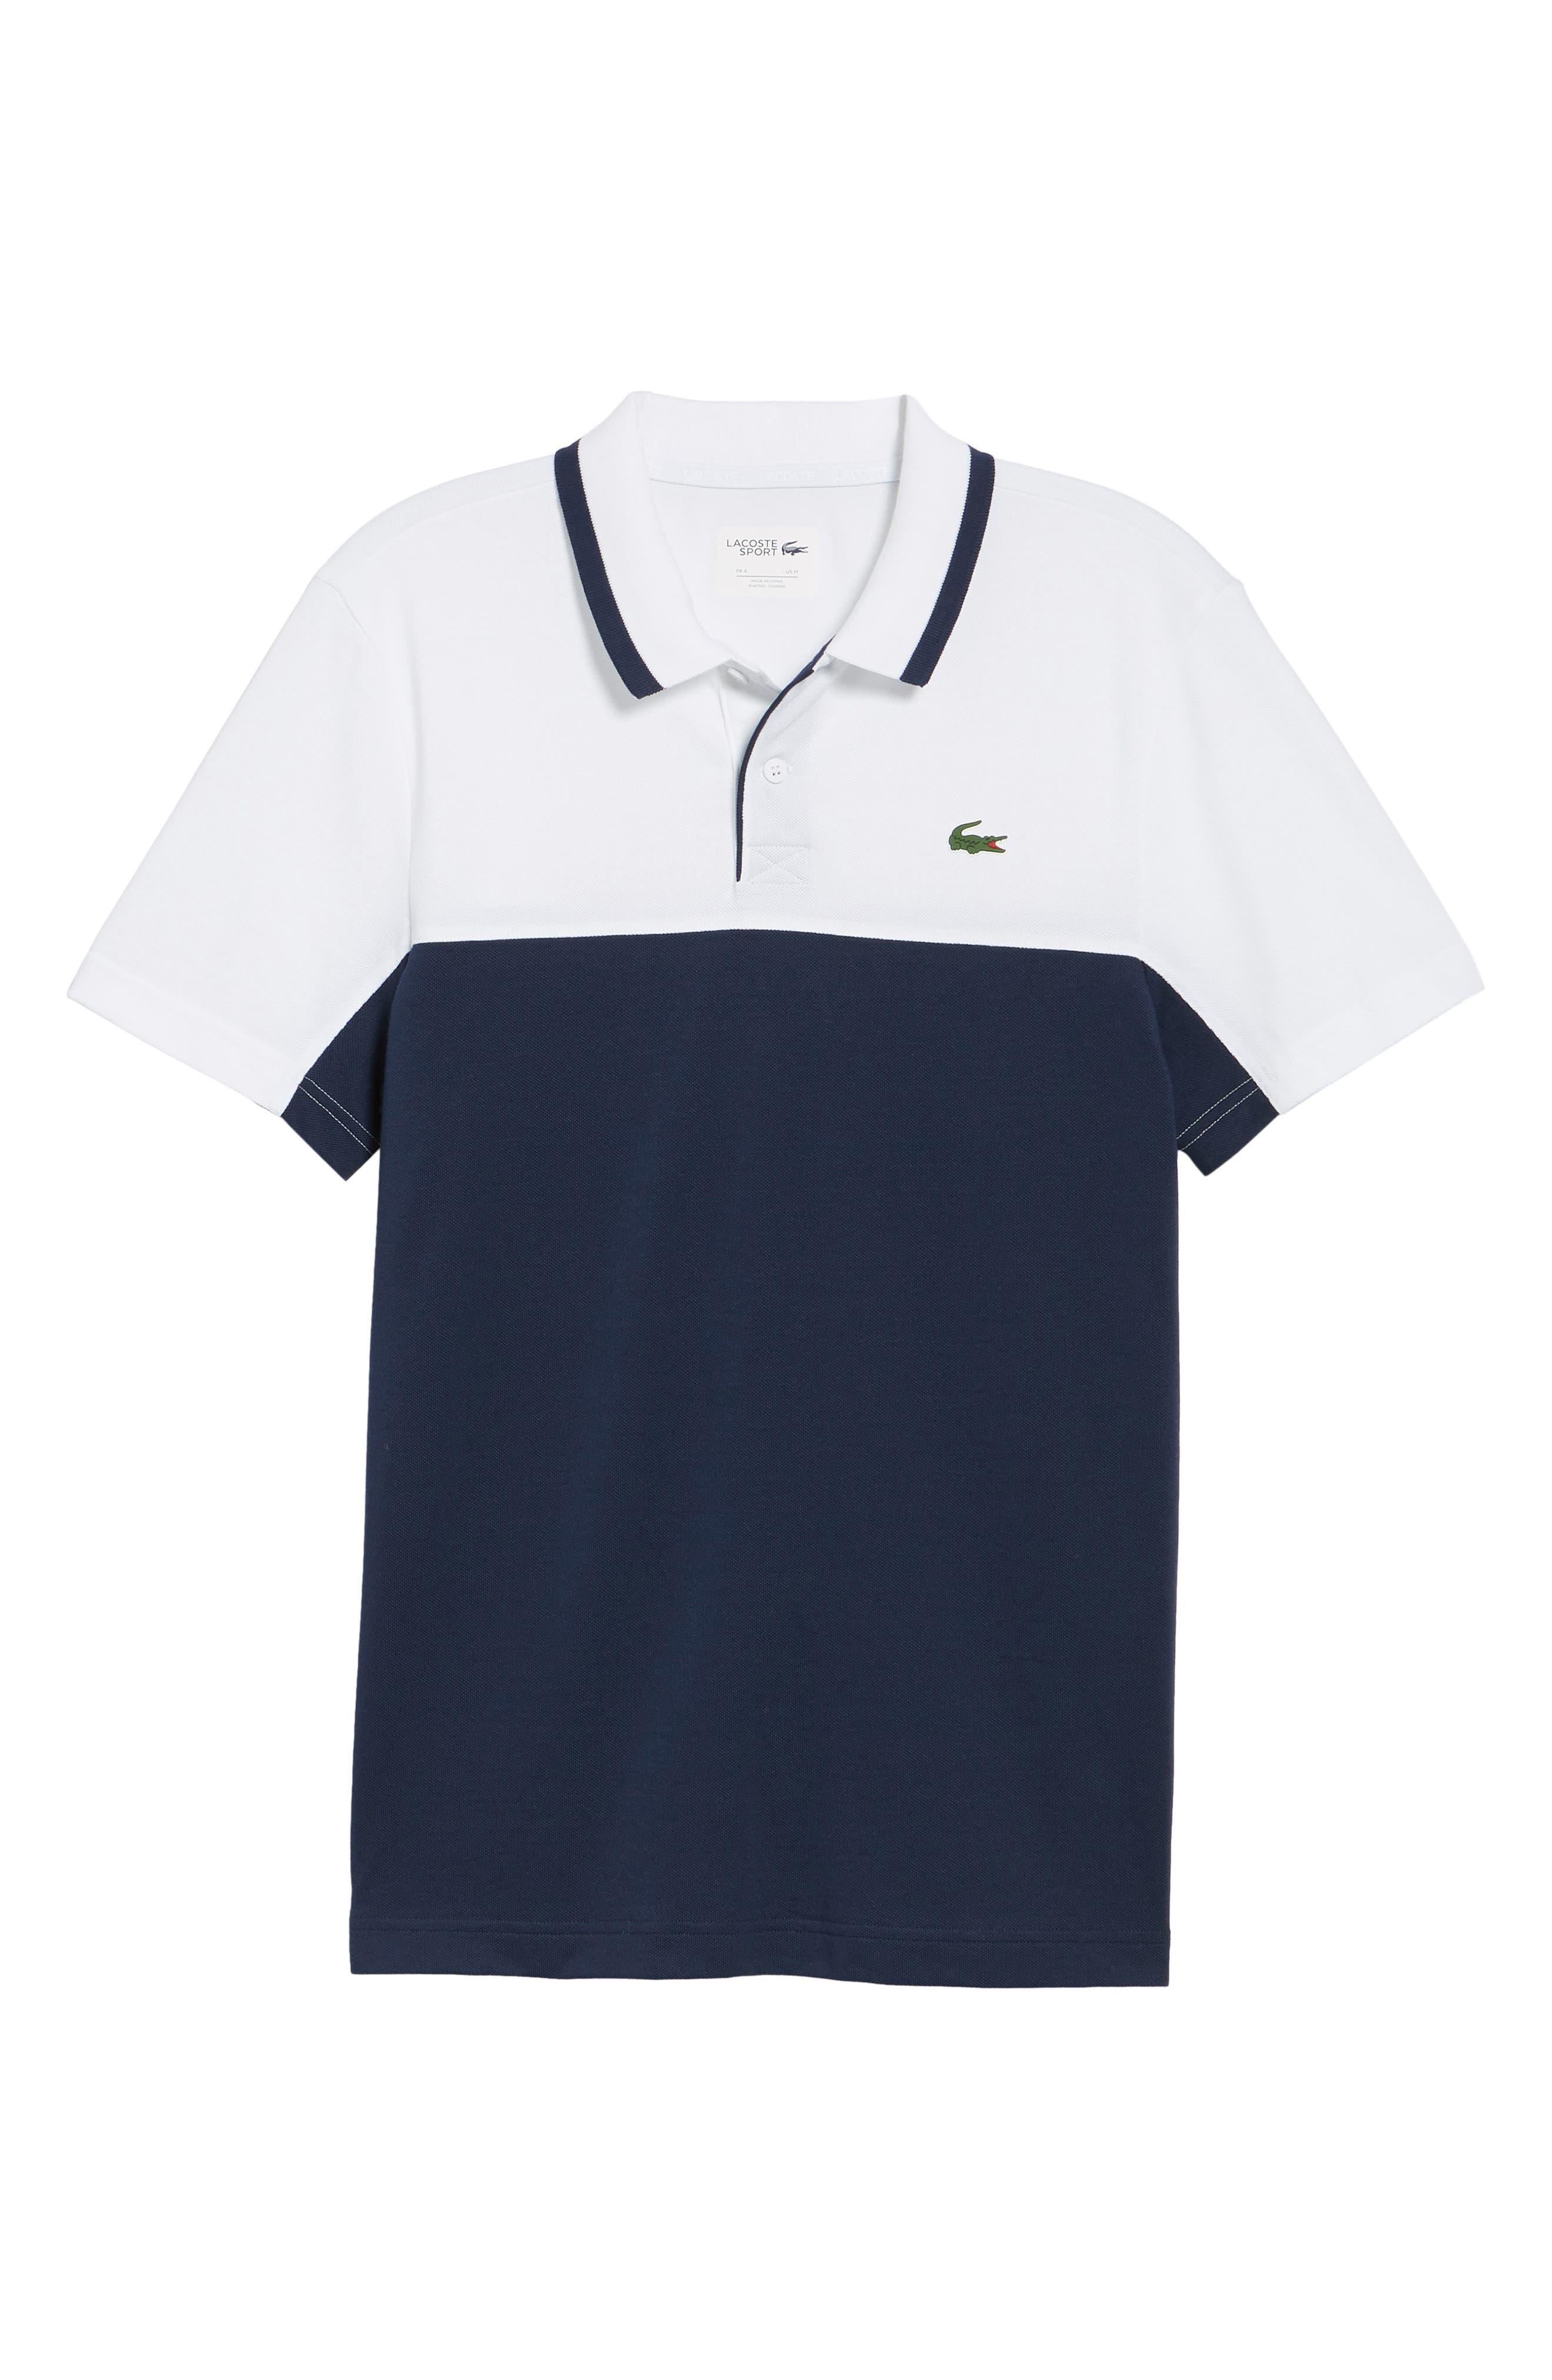 Piqué Cotton Blend Polo,                             Alternate thumbnail 6, color,                             White/ Navy Blue